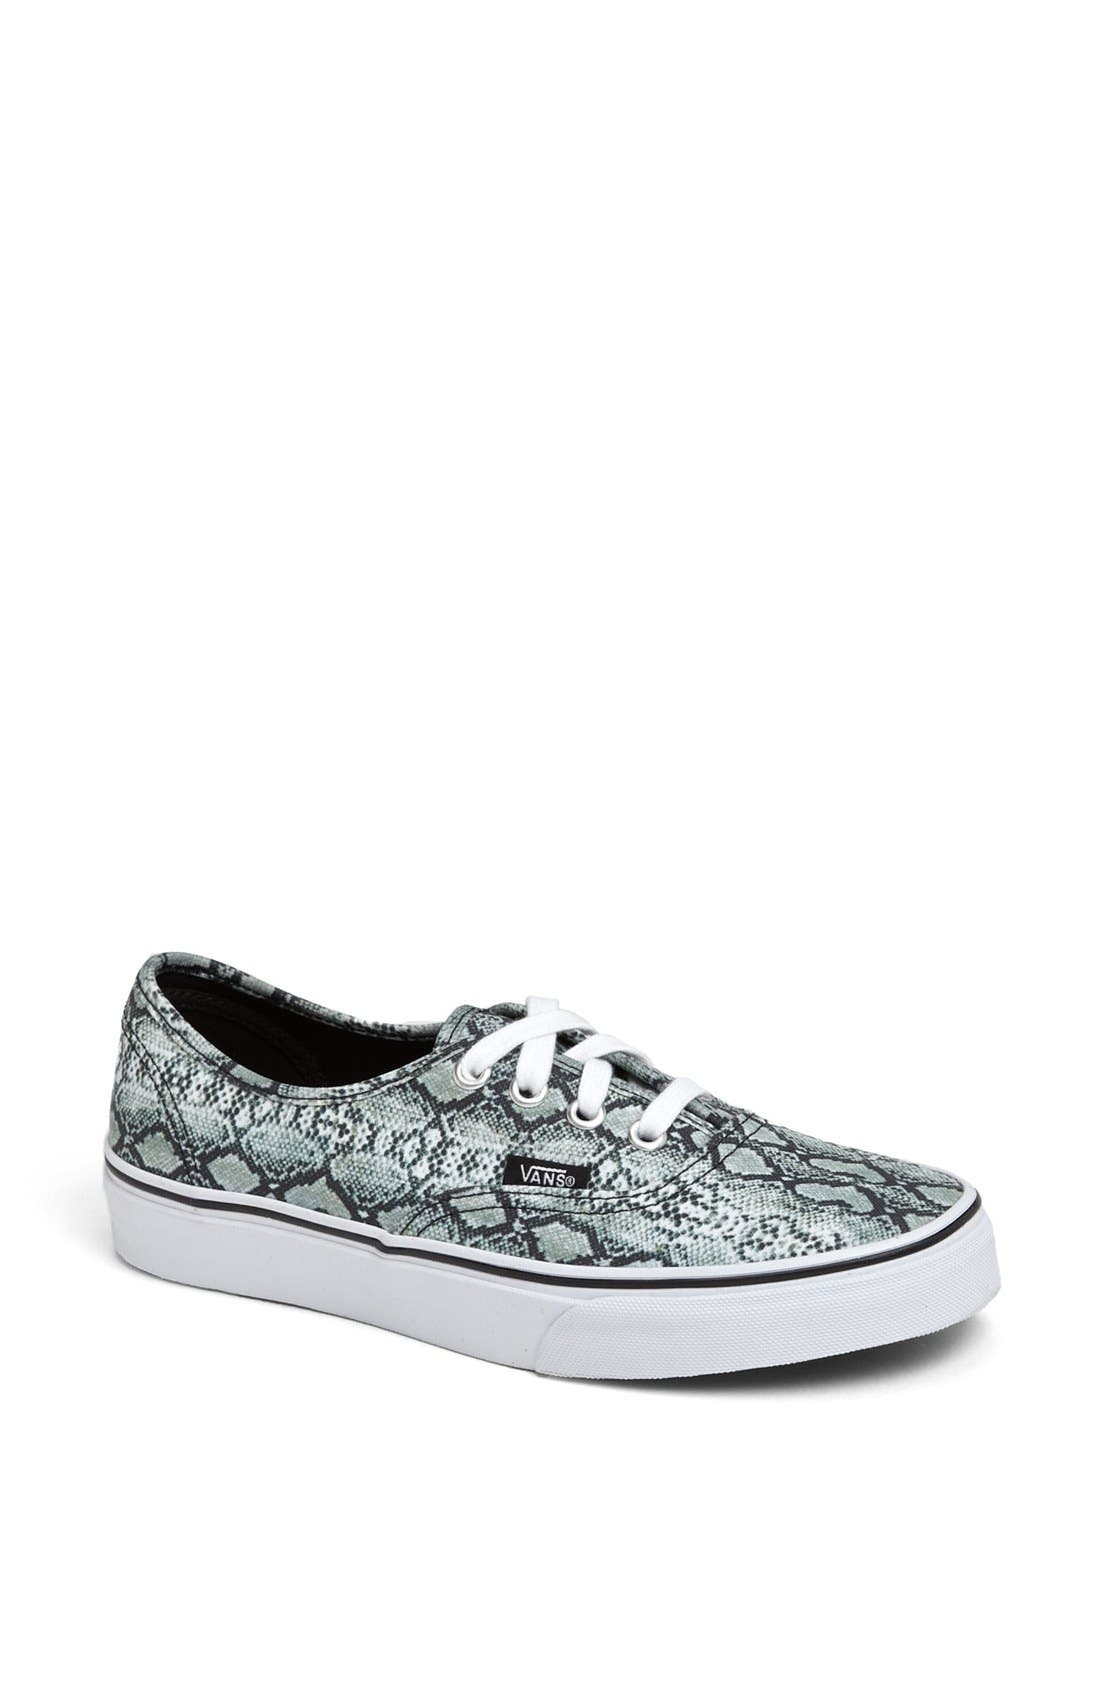 Alternate Image 1 Selected - Vans 'Authentic - Snake Print' Sneaker (Women)